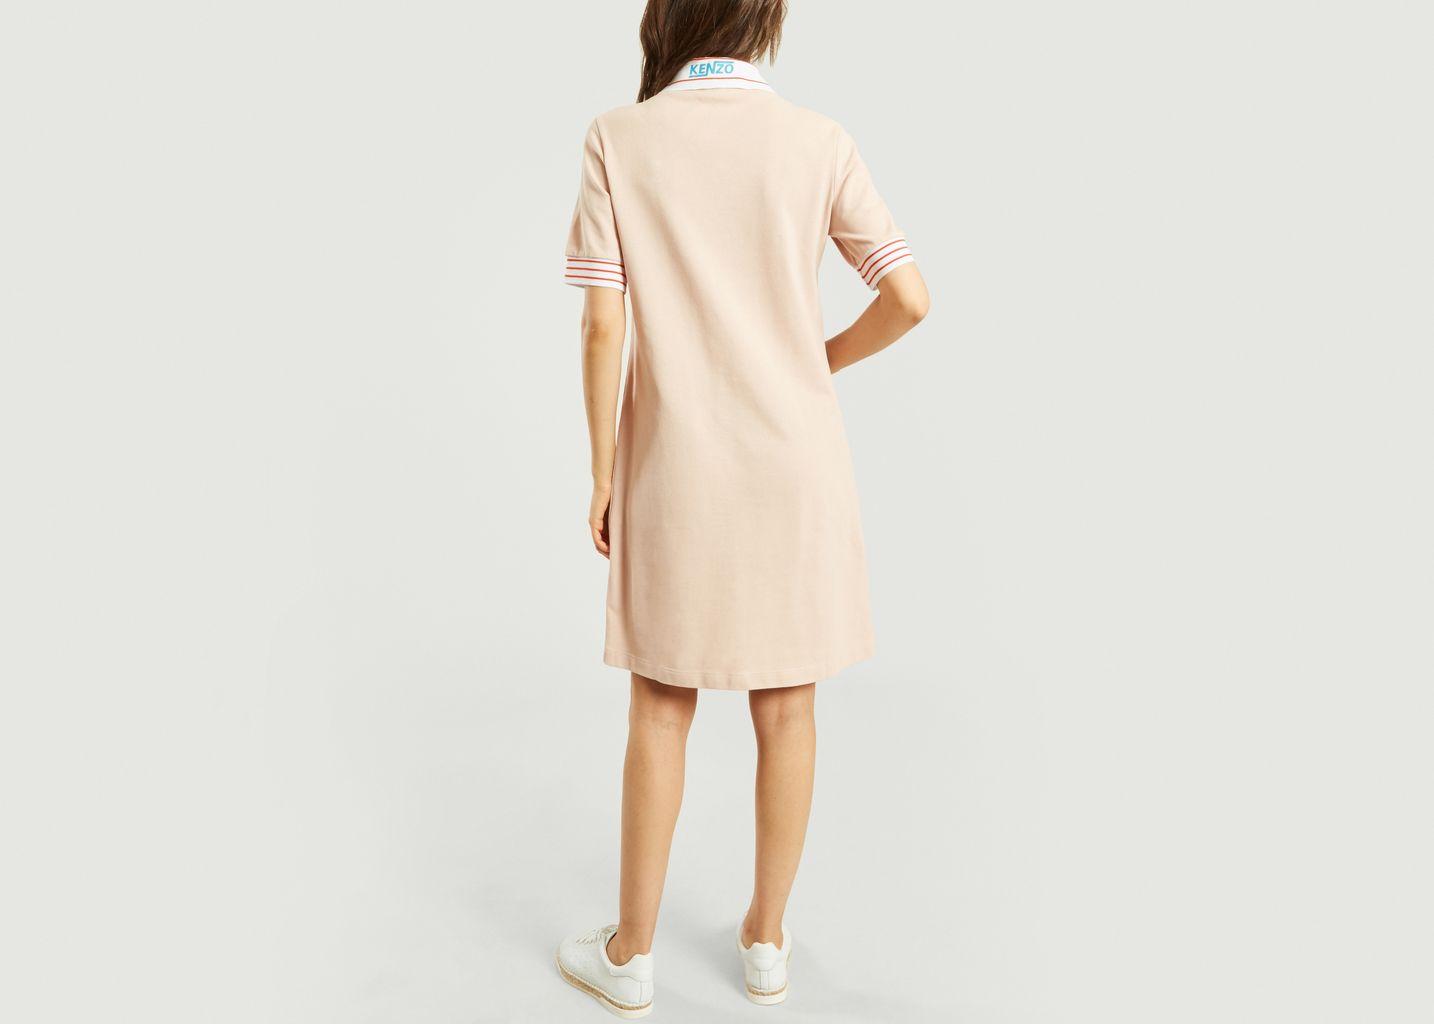 Robe-Polo Hyper Kenzo - Kenzo